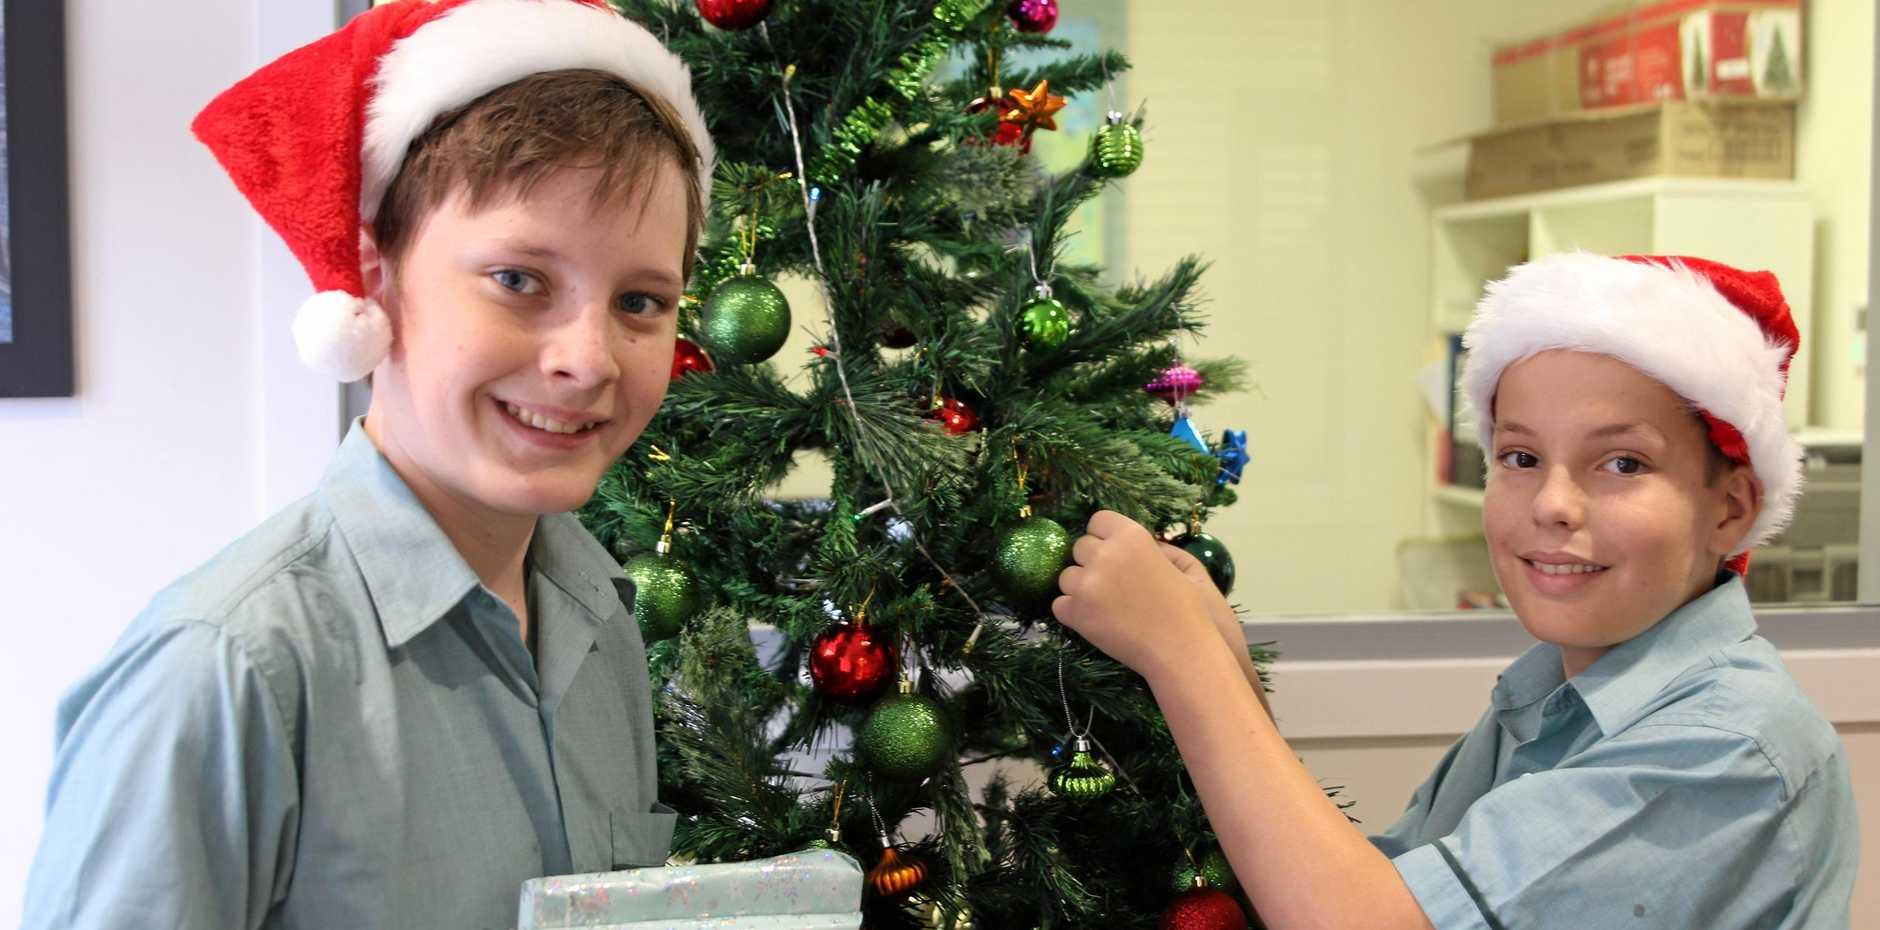 The Joys Of Christmas.St Brendan S Students Sharing The Joys Of Christmas